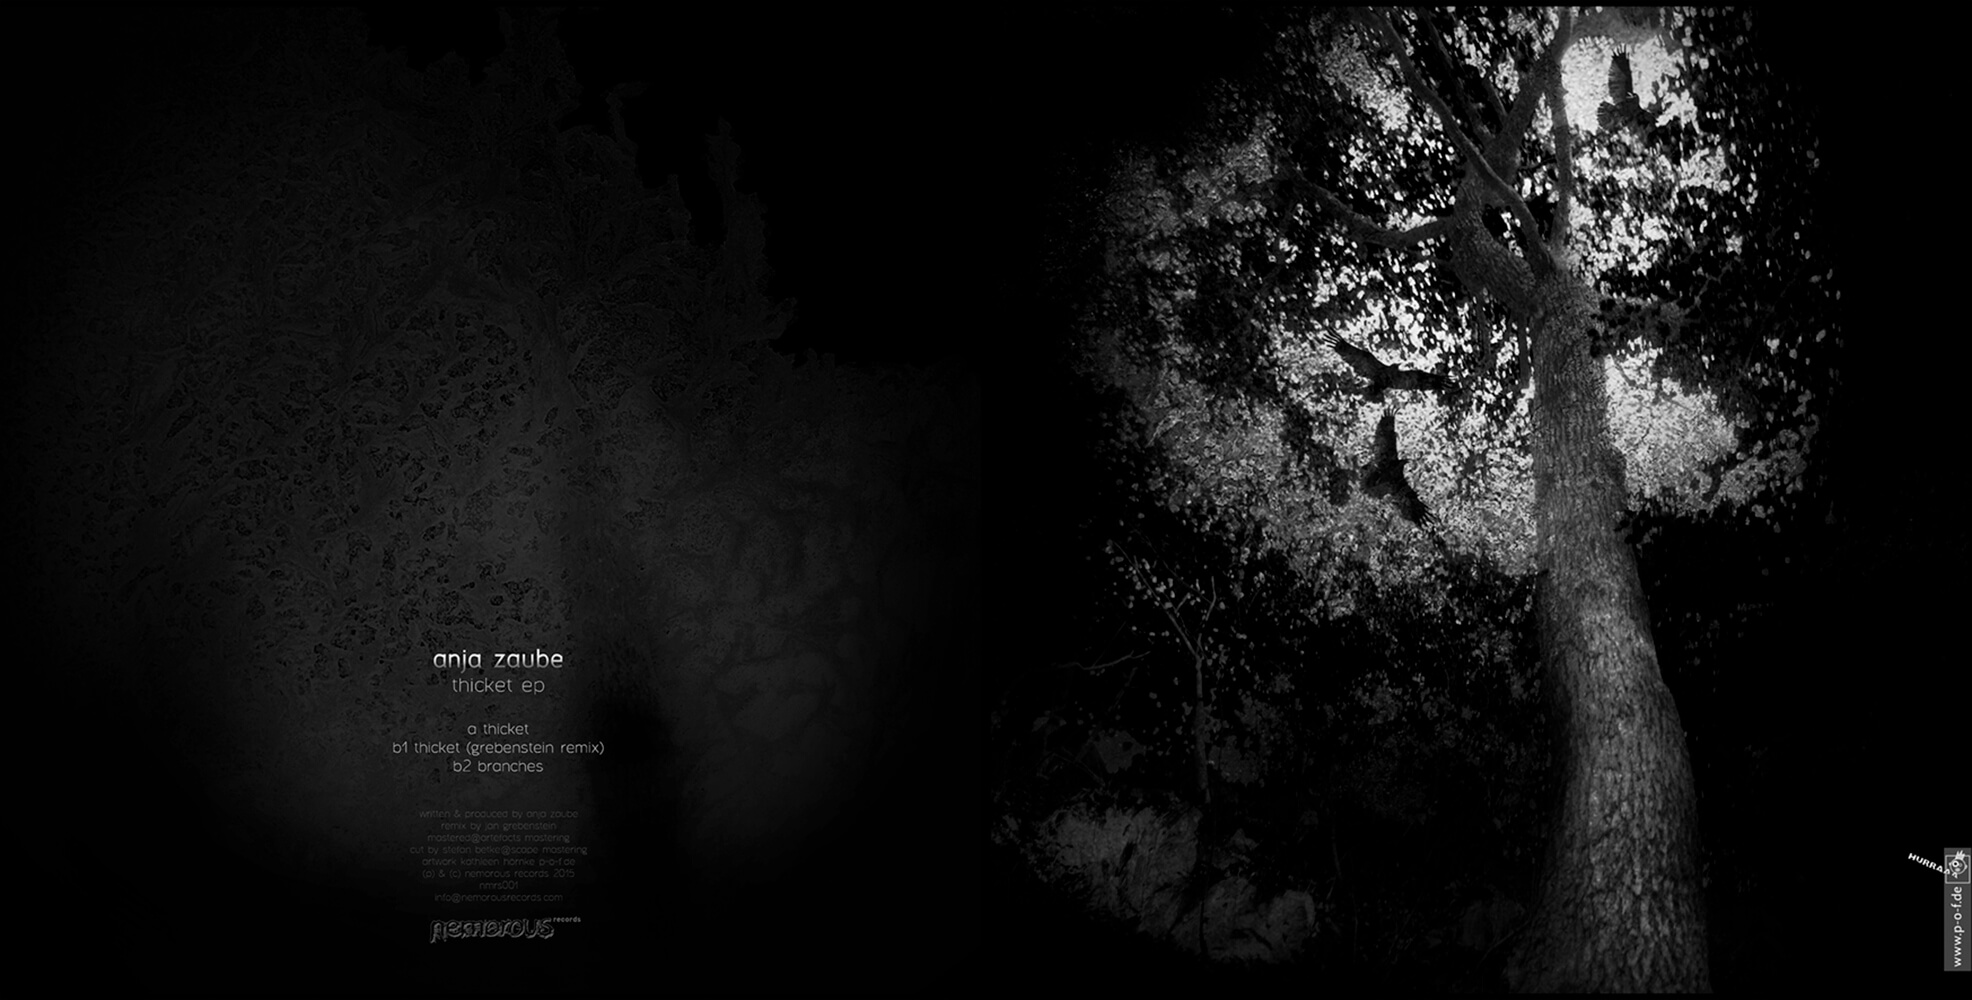 erstes Plattencover zu Anja Zaube auf dem Label Nemorous